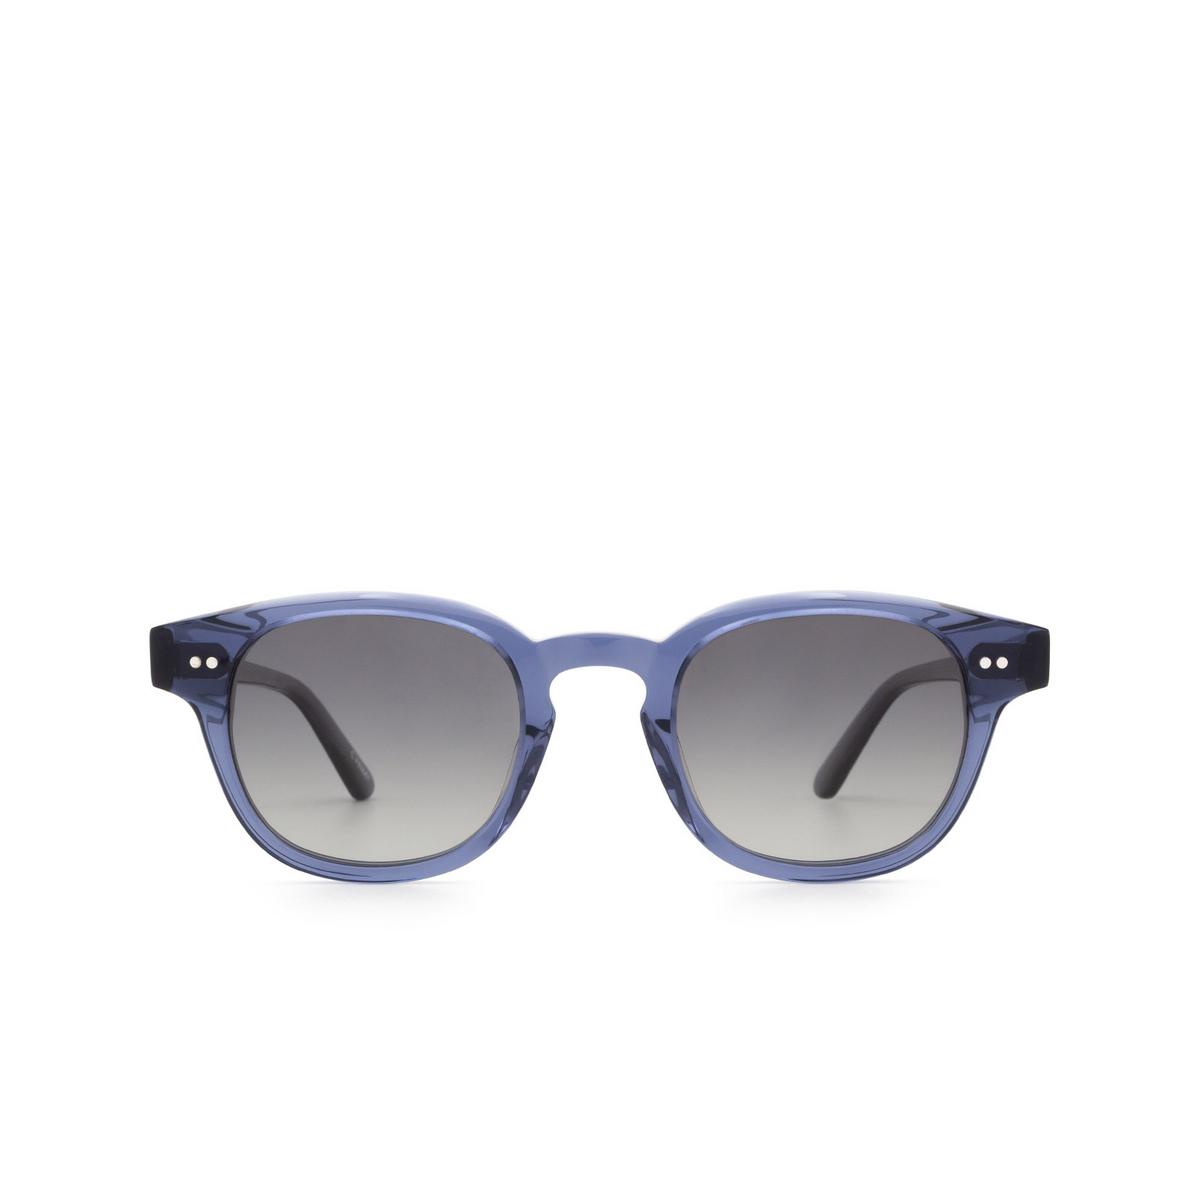 Chimi® Square Sunglasses: 01 color Blue - front view.